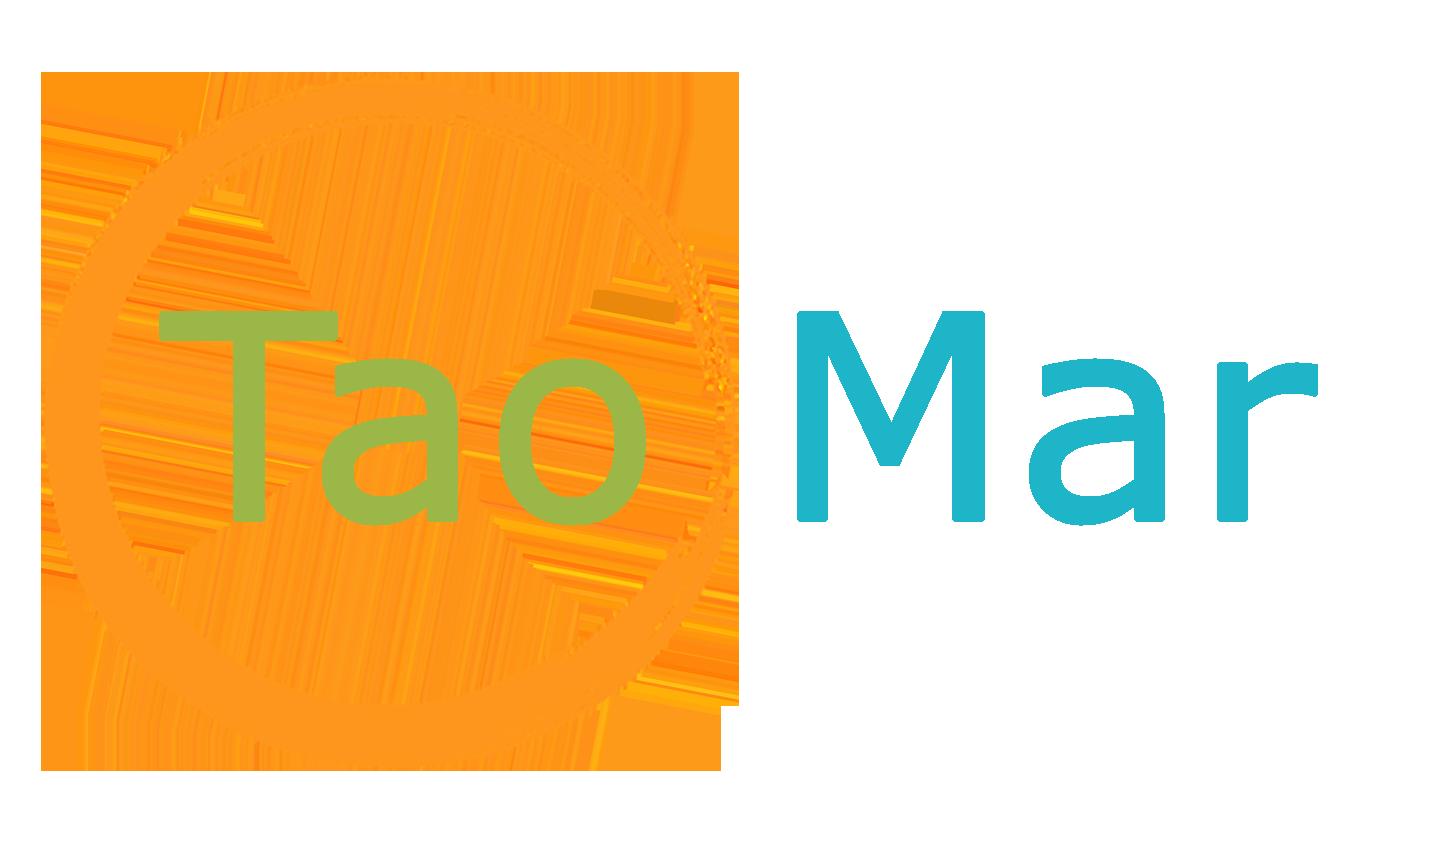 Tao Mar